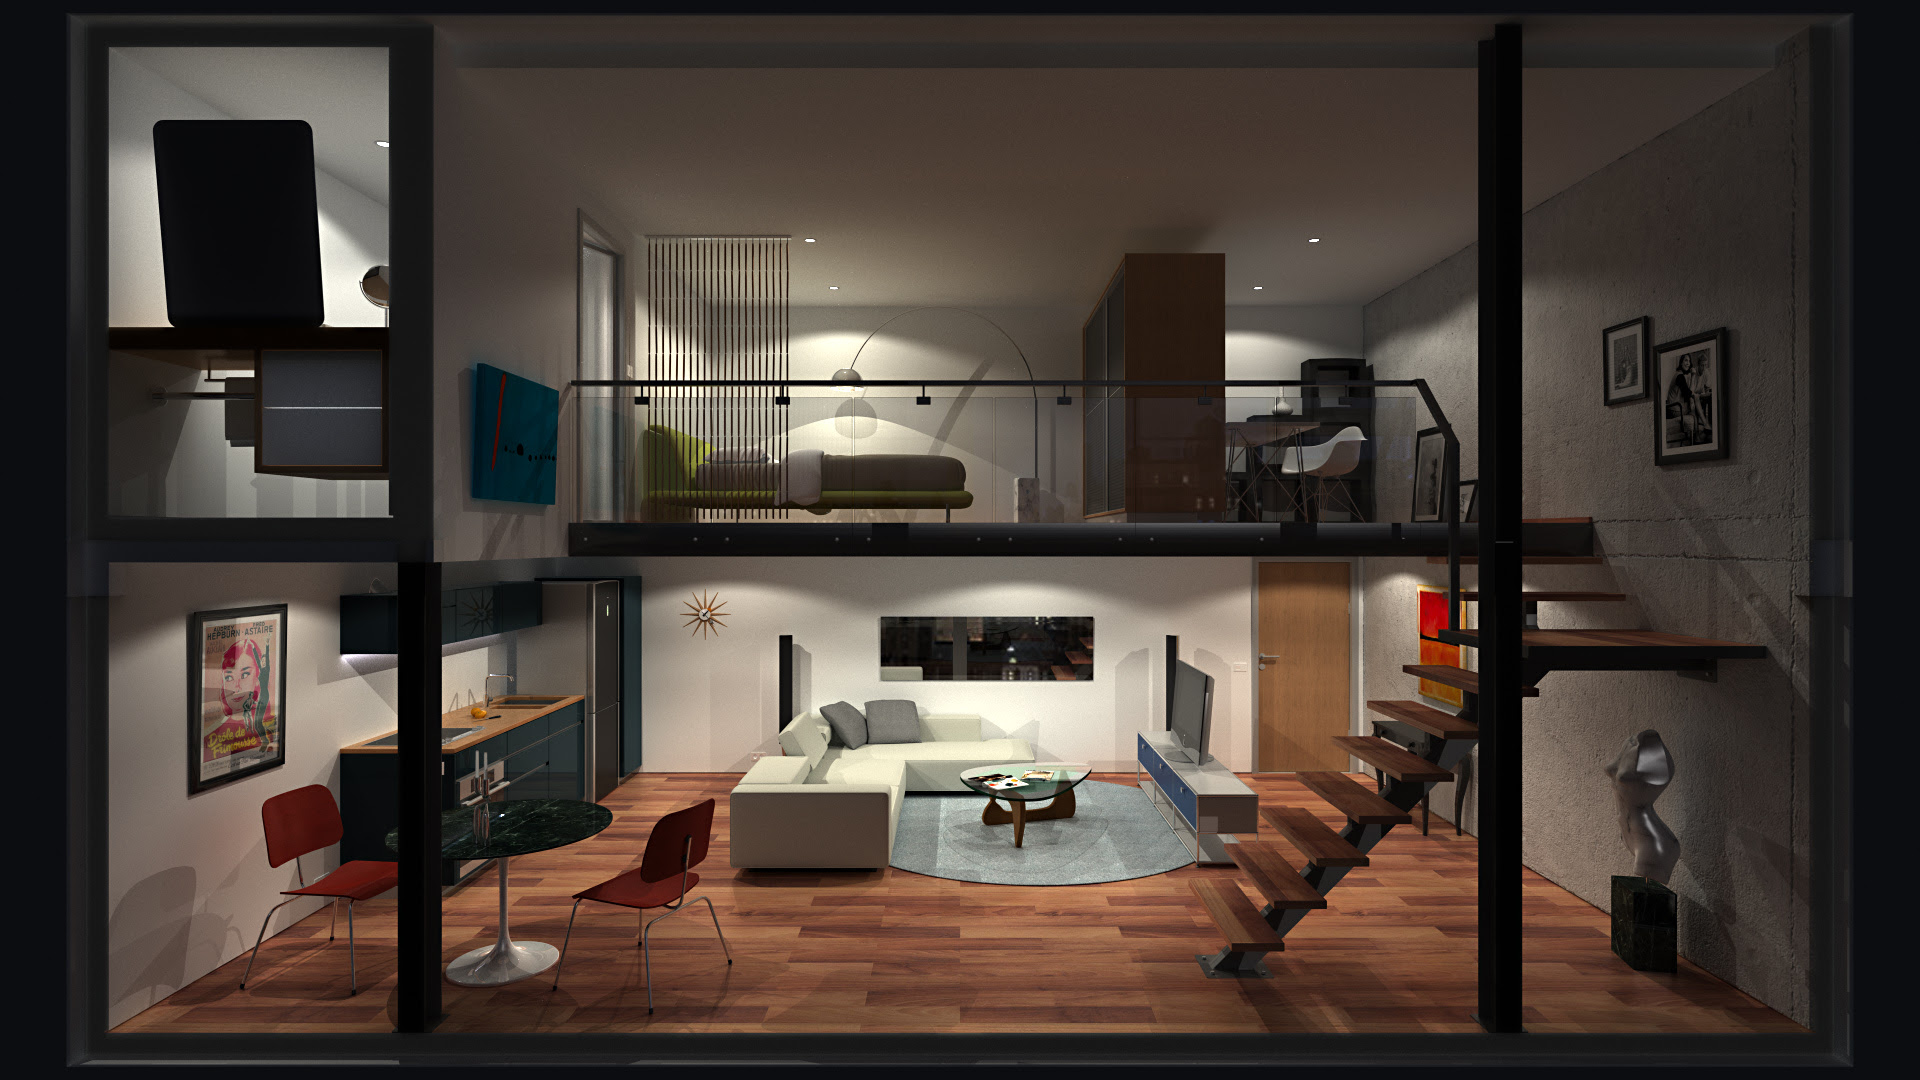 Loft_Apartment_0___HD__Night_by_richert